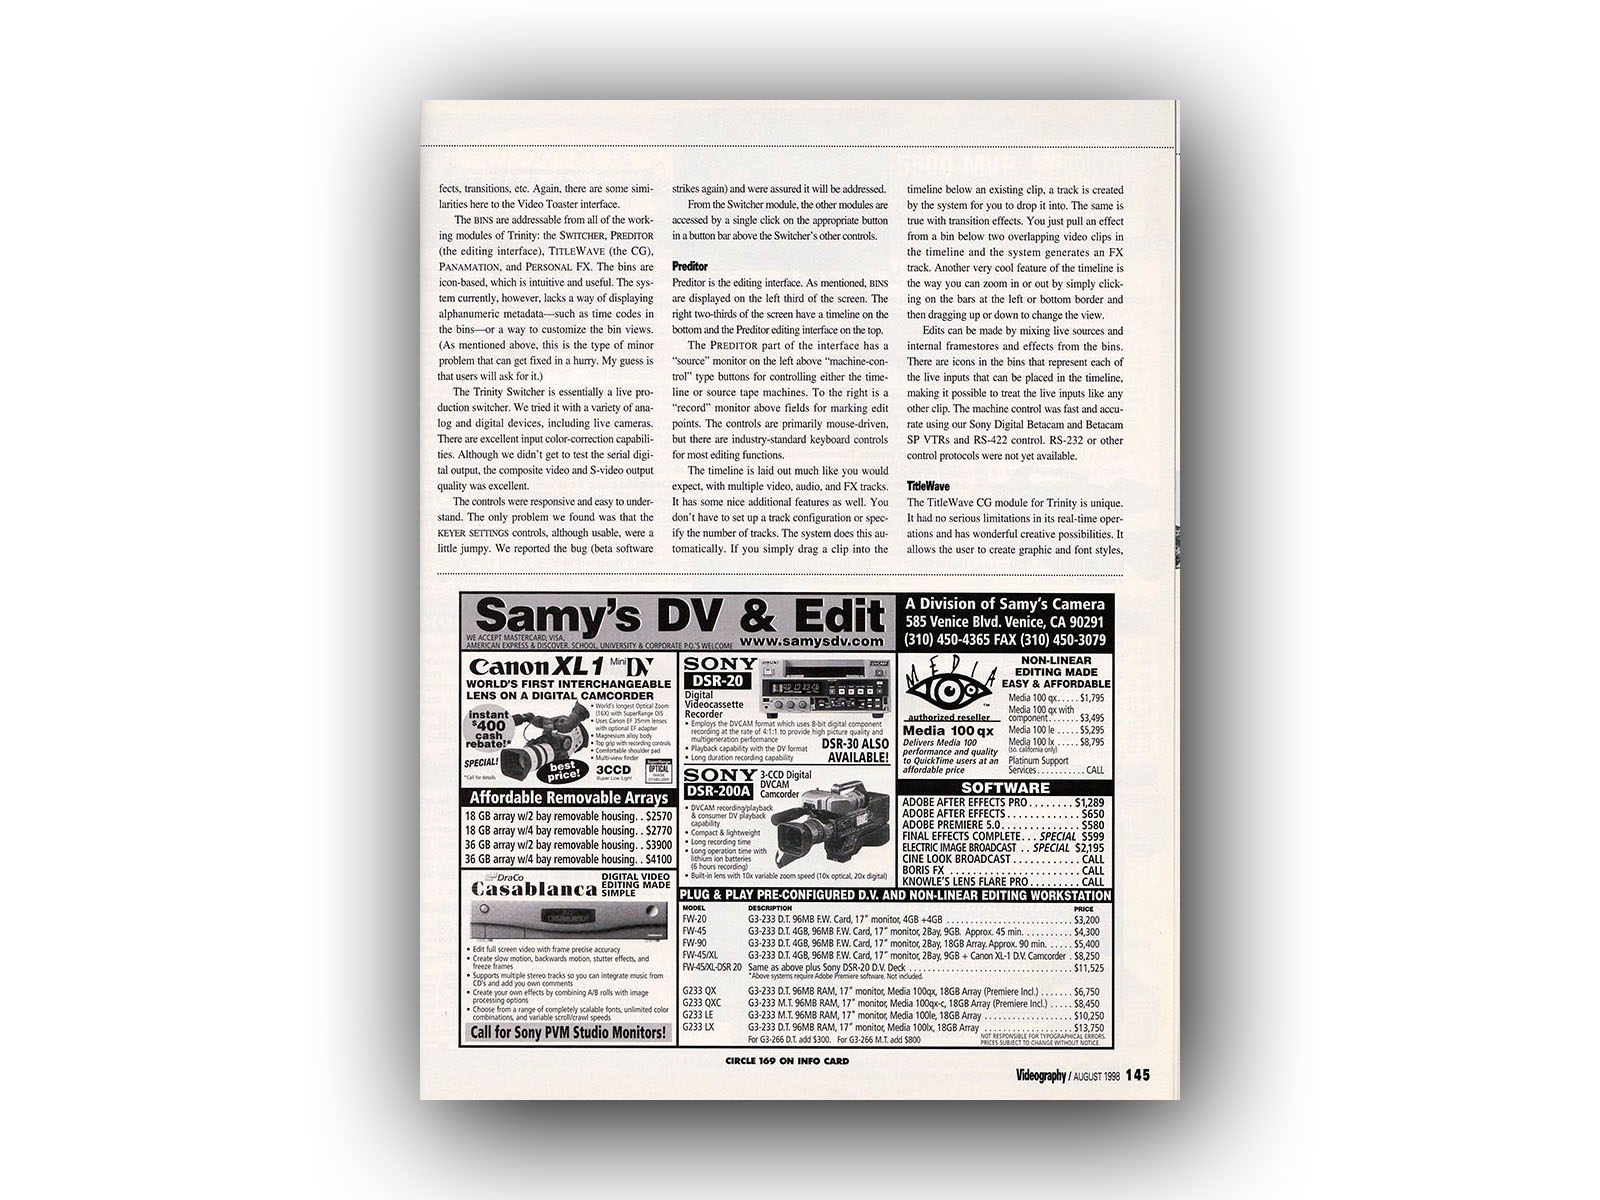 _0007_MagazineVideography-Fall98-P145_web.jpg